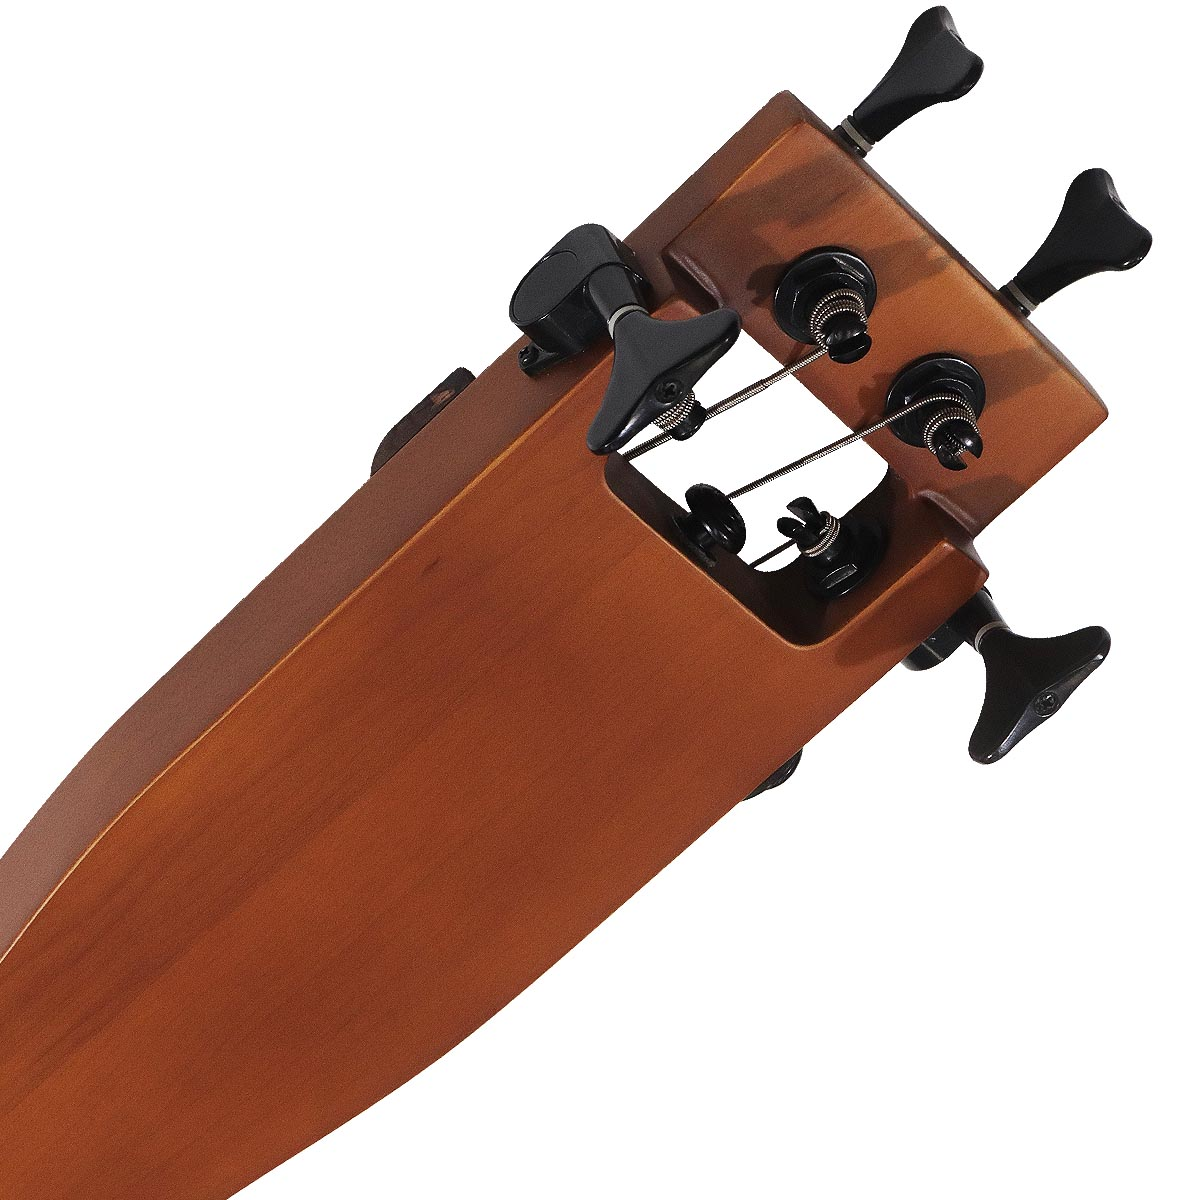 anygig agb full scale length travel bass guitar backpacker portable bag ebay. Black Bedroom Furniture Sets. Home Design Ideas